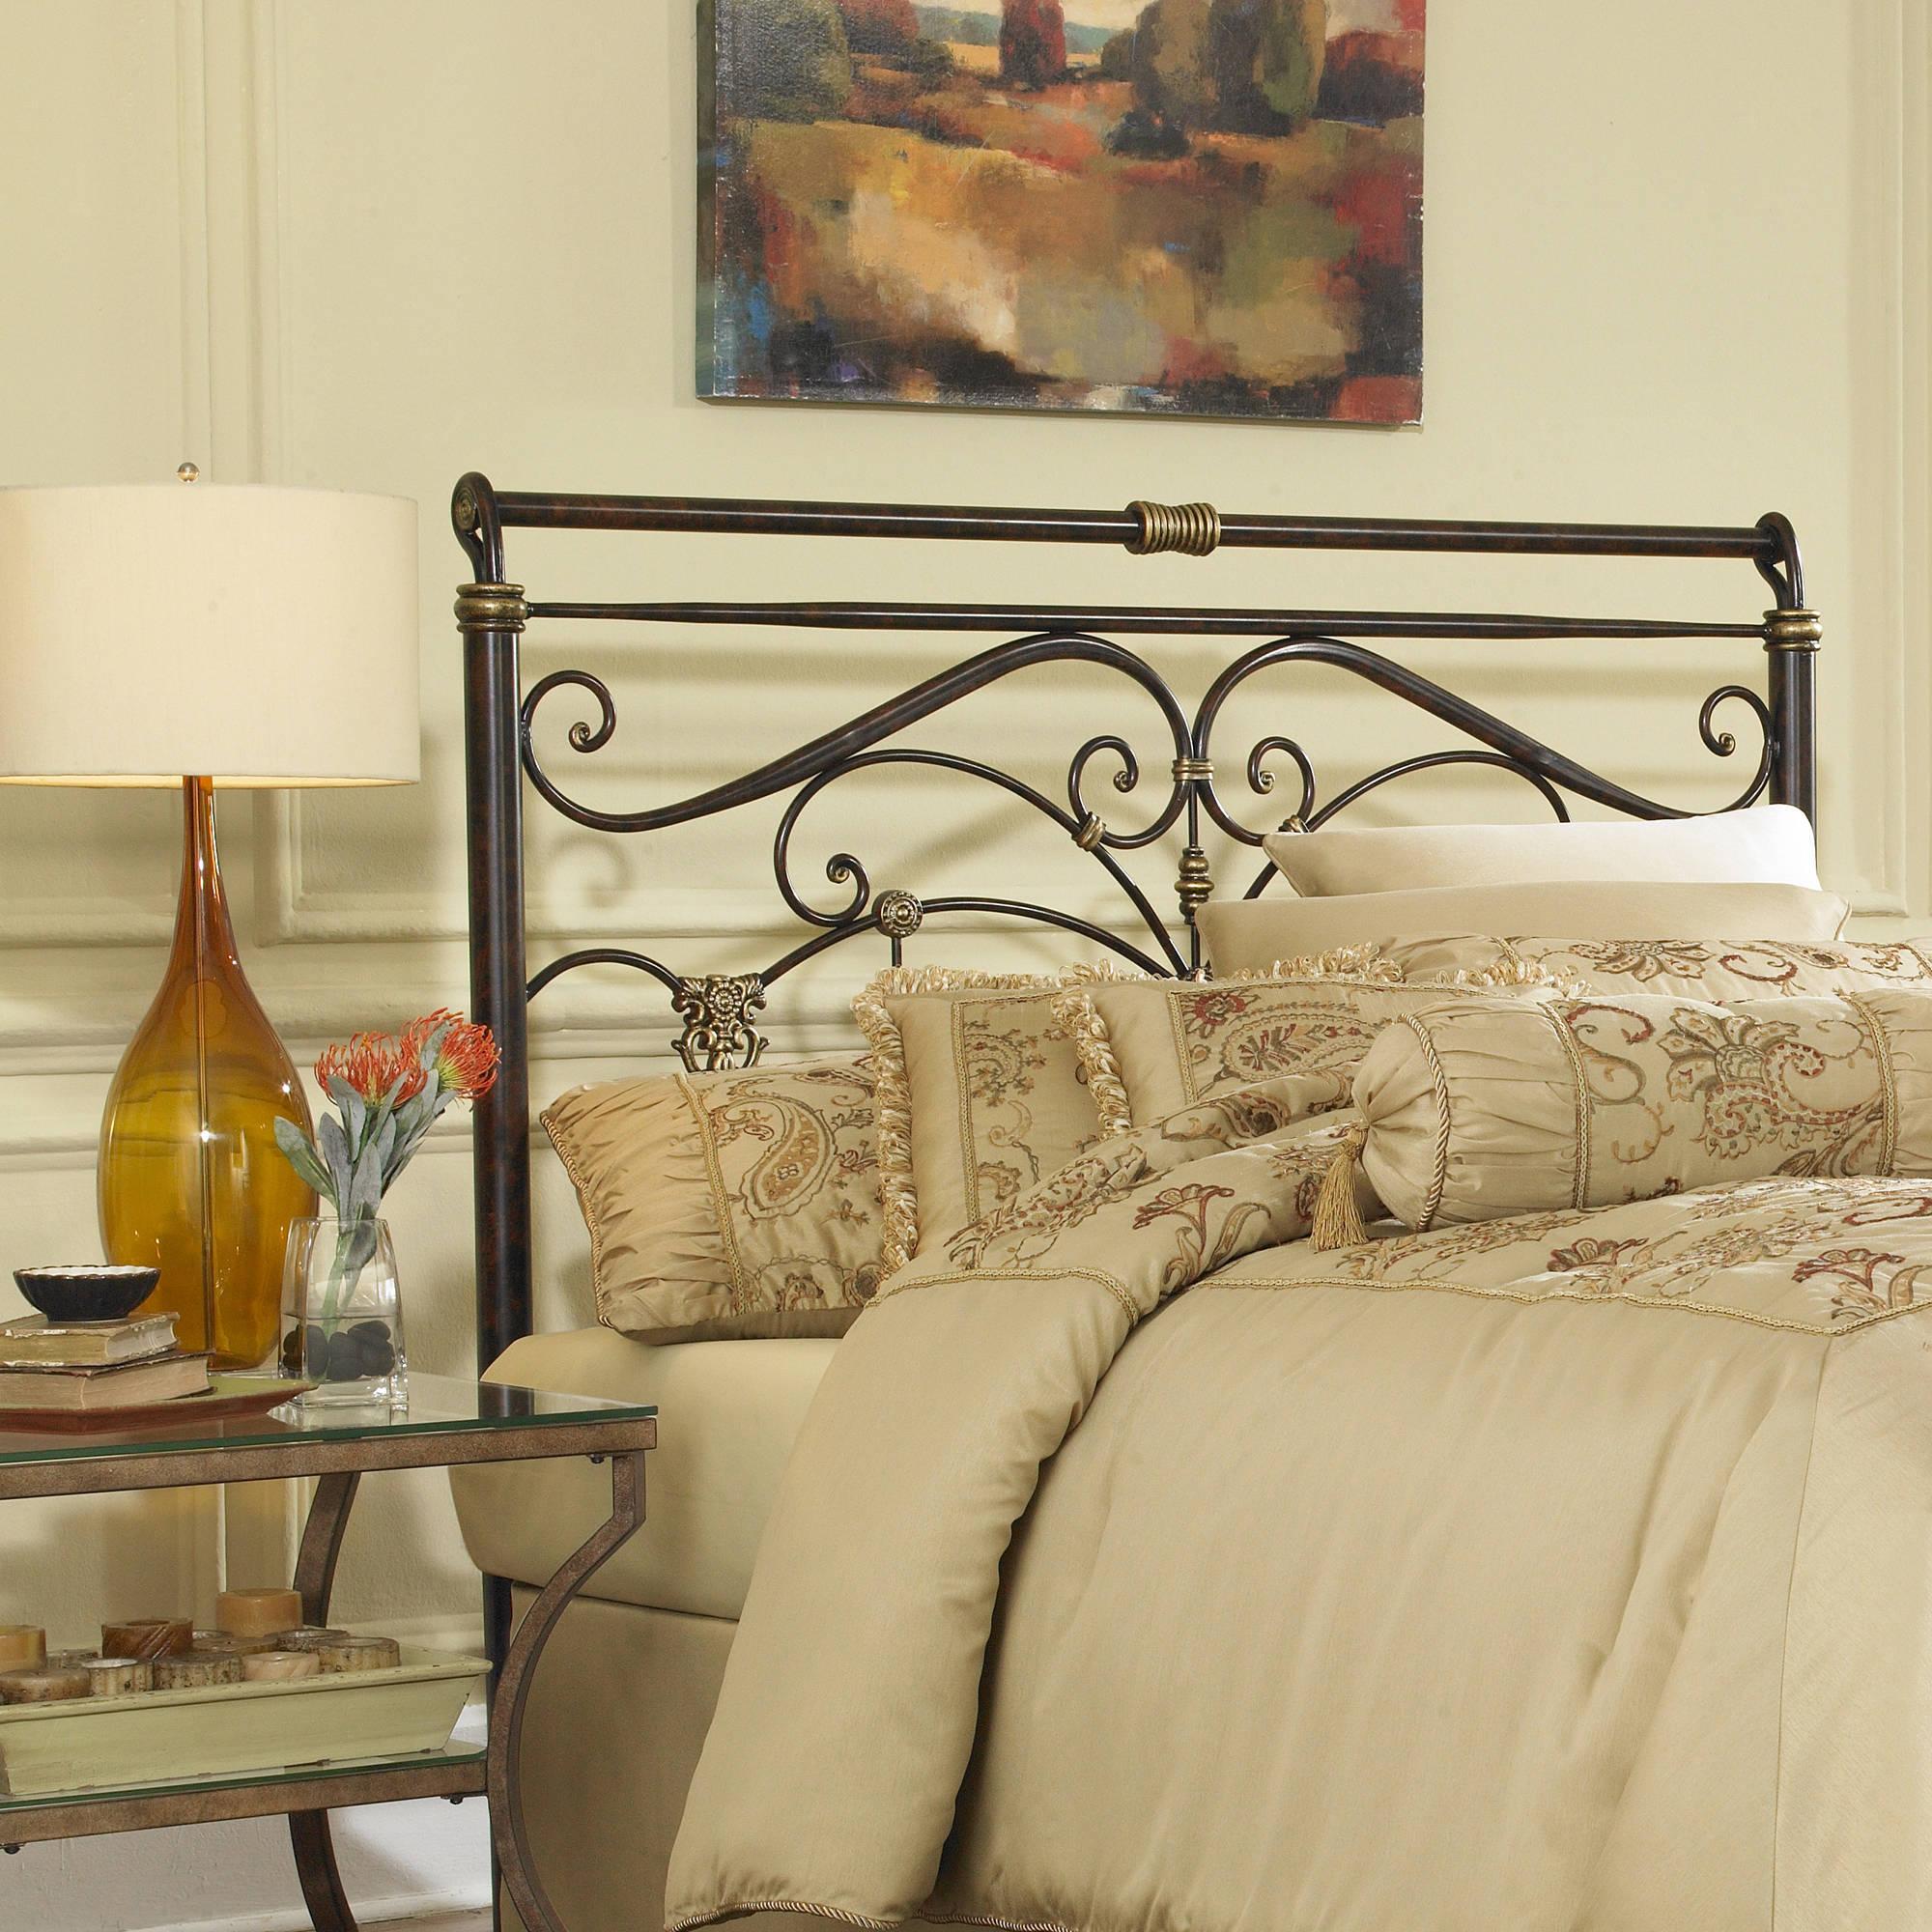 Leggett & Platt Fashion Bed Group Lucinda Headboard, Marbled Russet